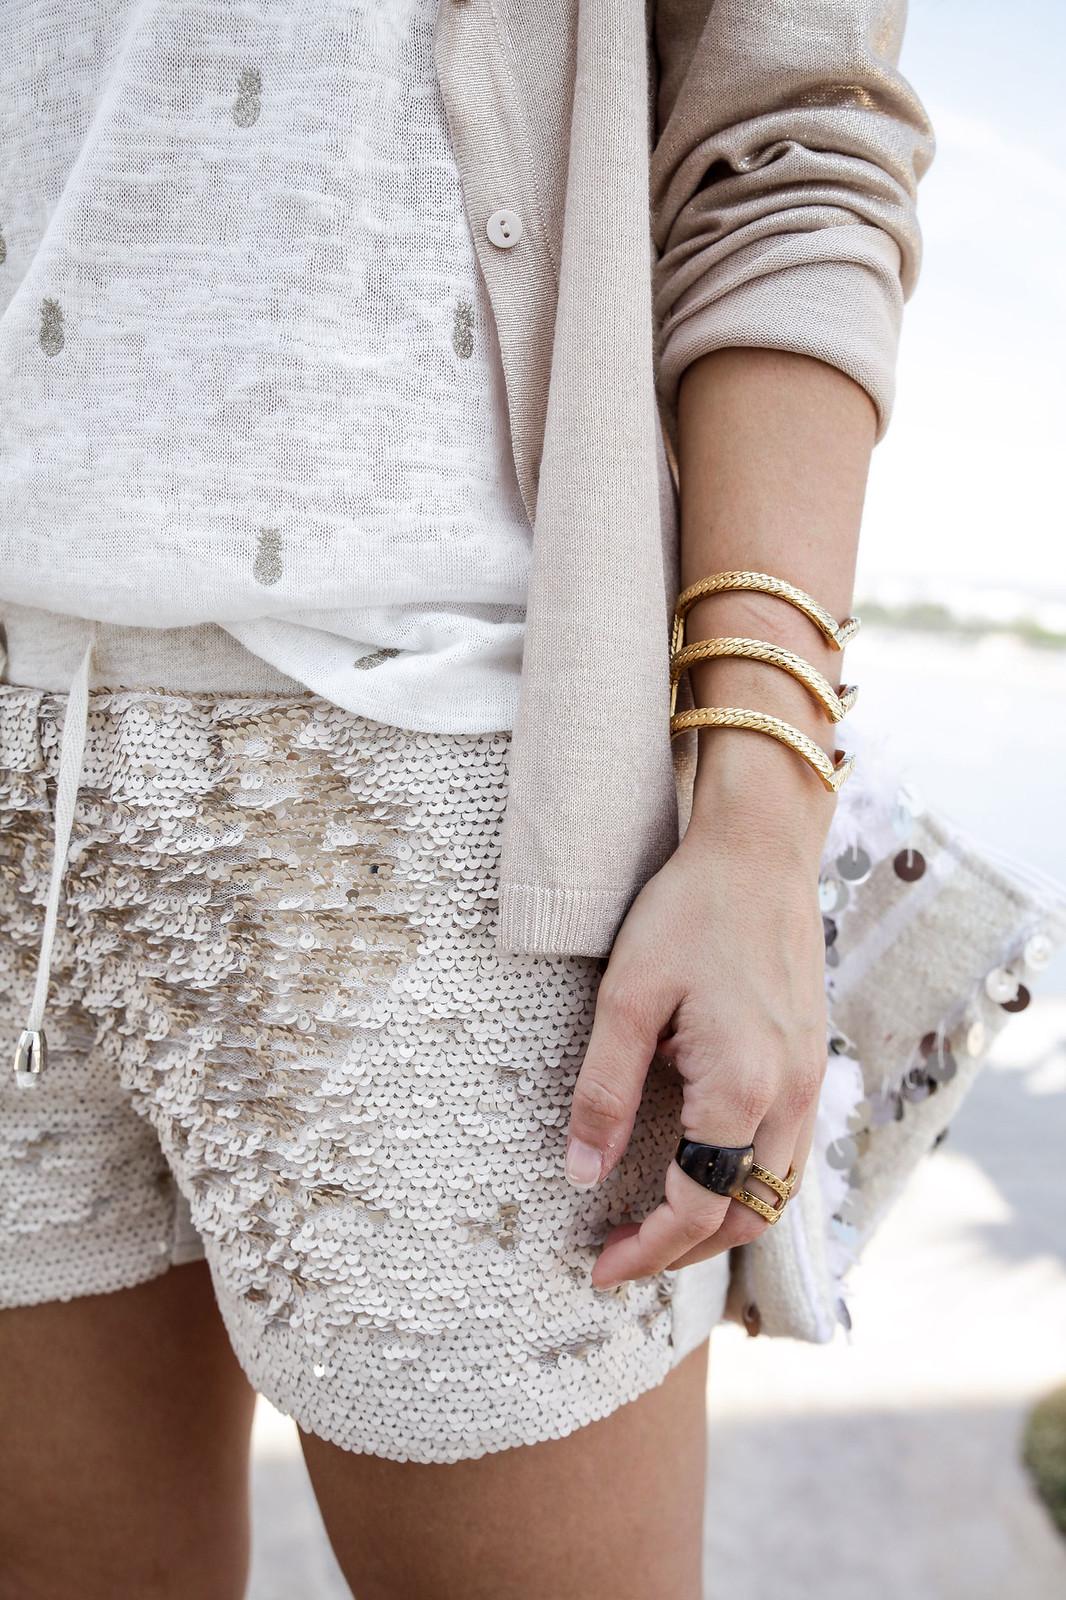 06_Shorts_lentejuelas_dorados_outfit_lelyjane_gold_shorts_theguetsgirl_laura_santolaria_influencer_barcelona_style